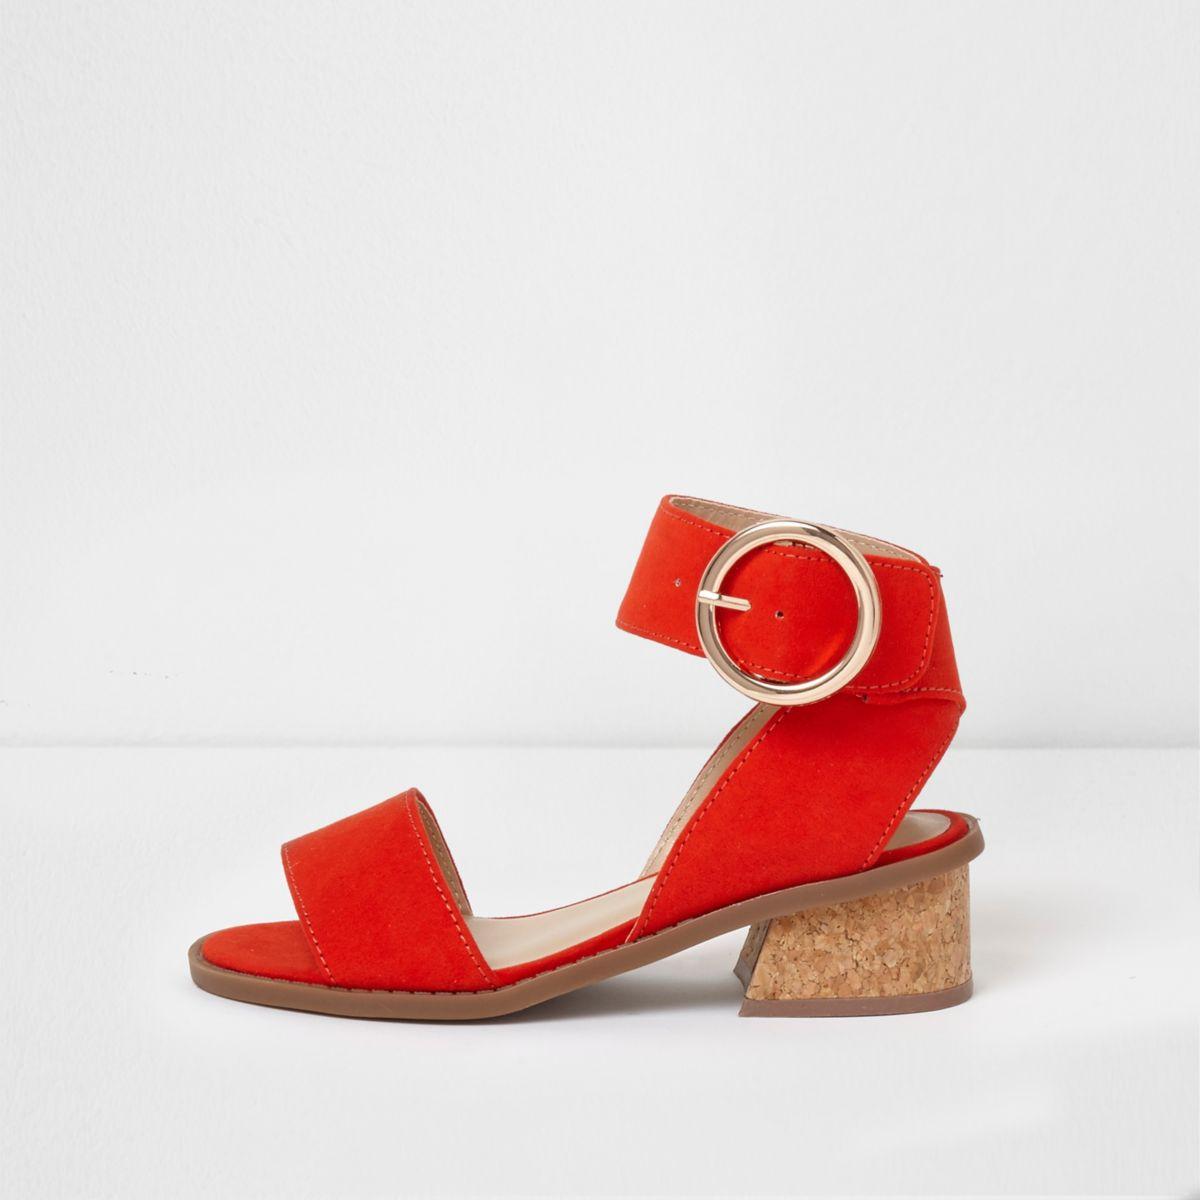 Girls red flared heel sandals